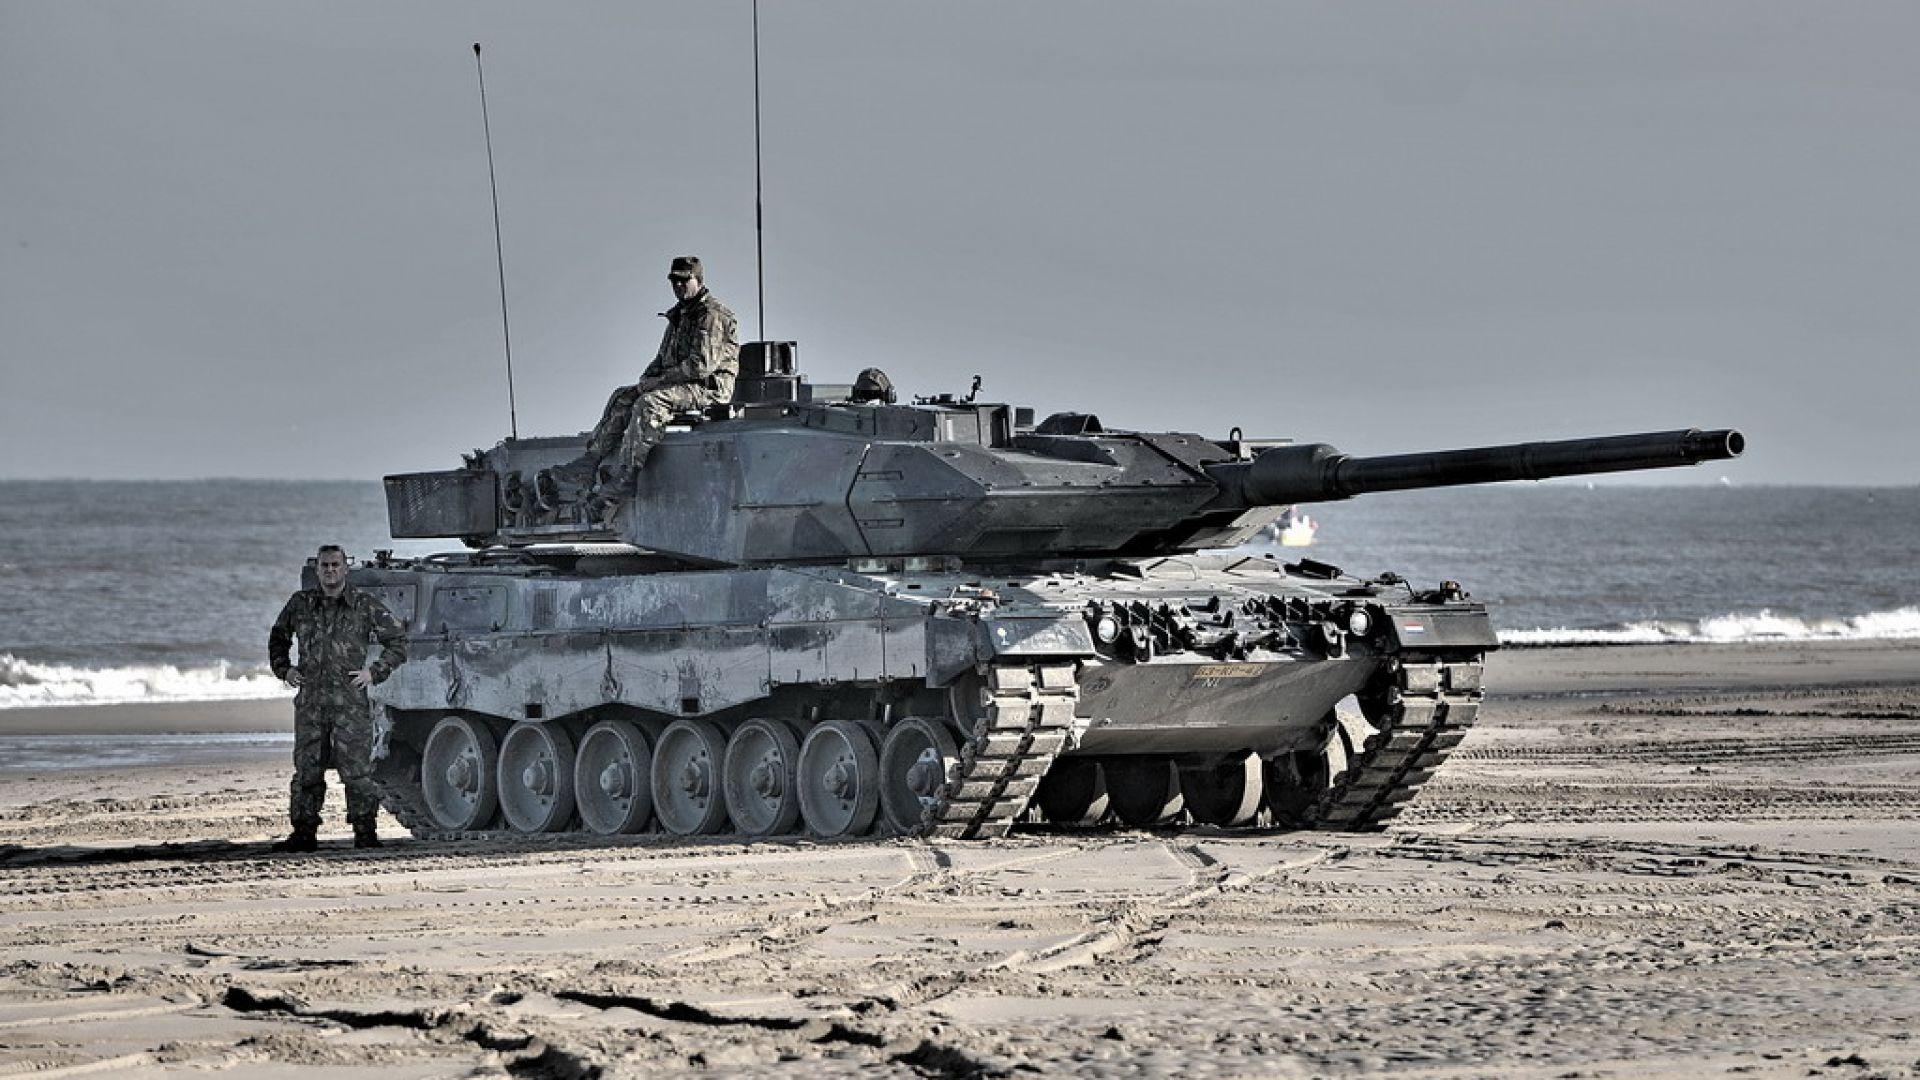 Leopard-2A6